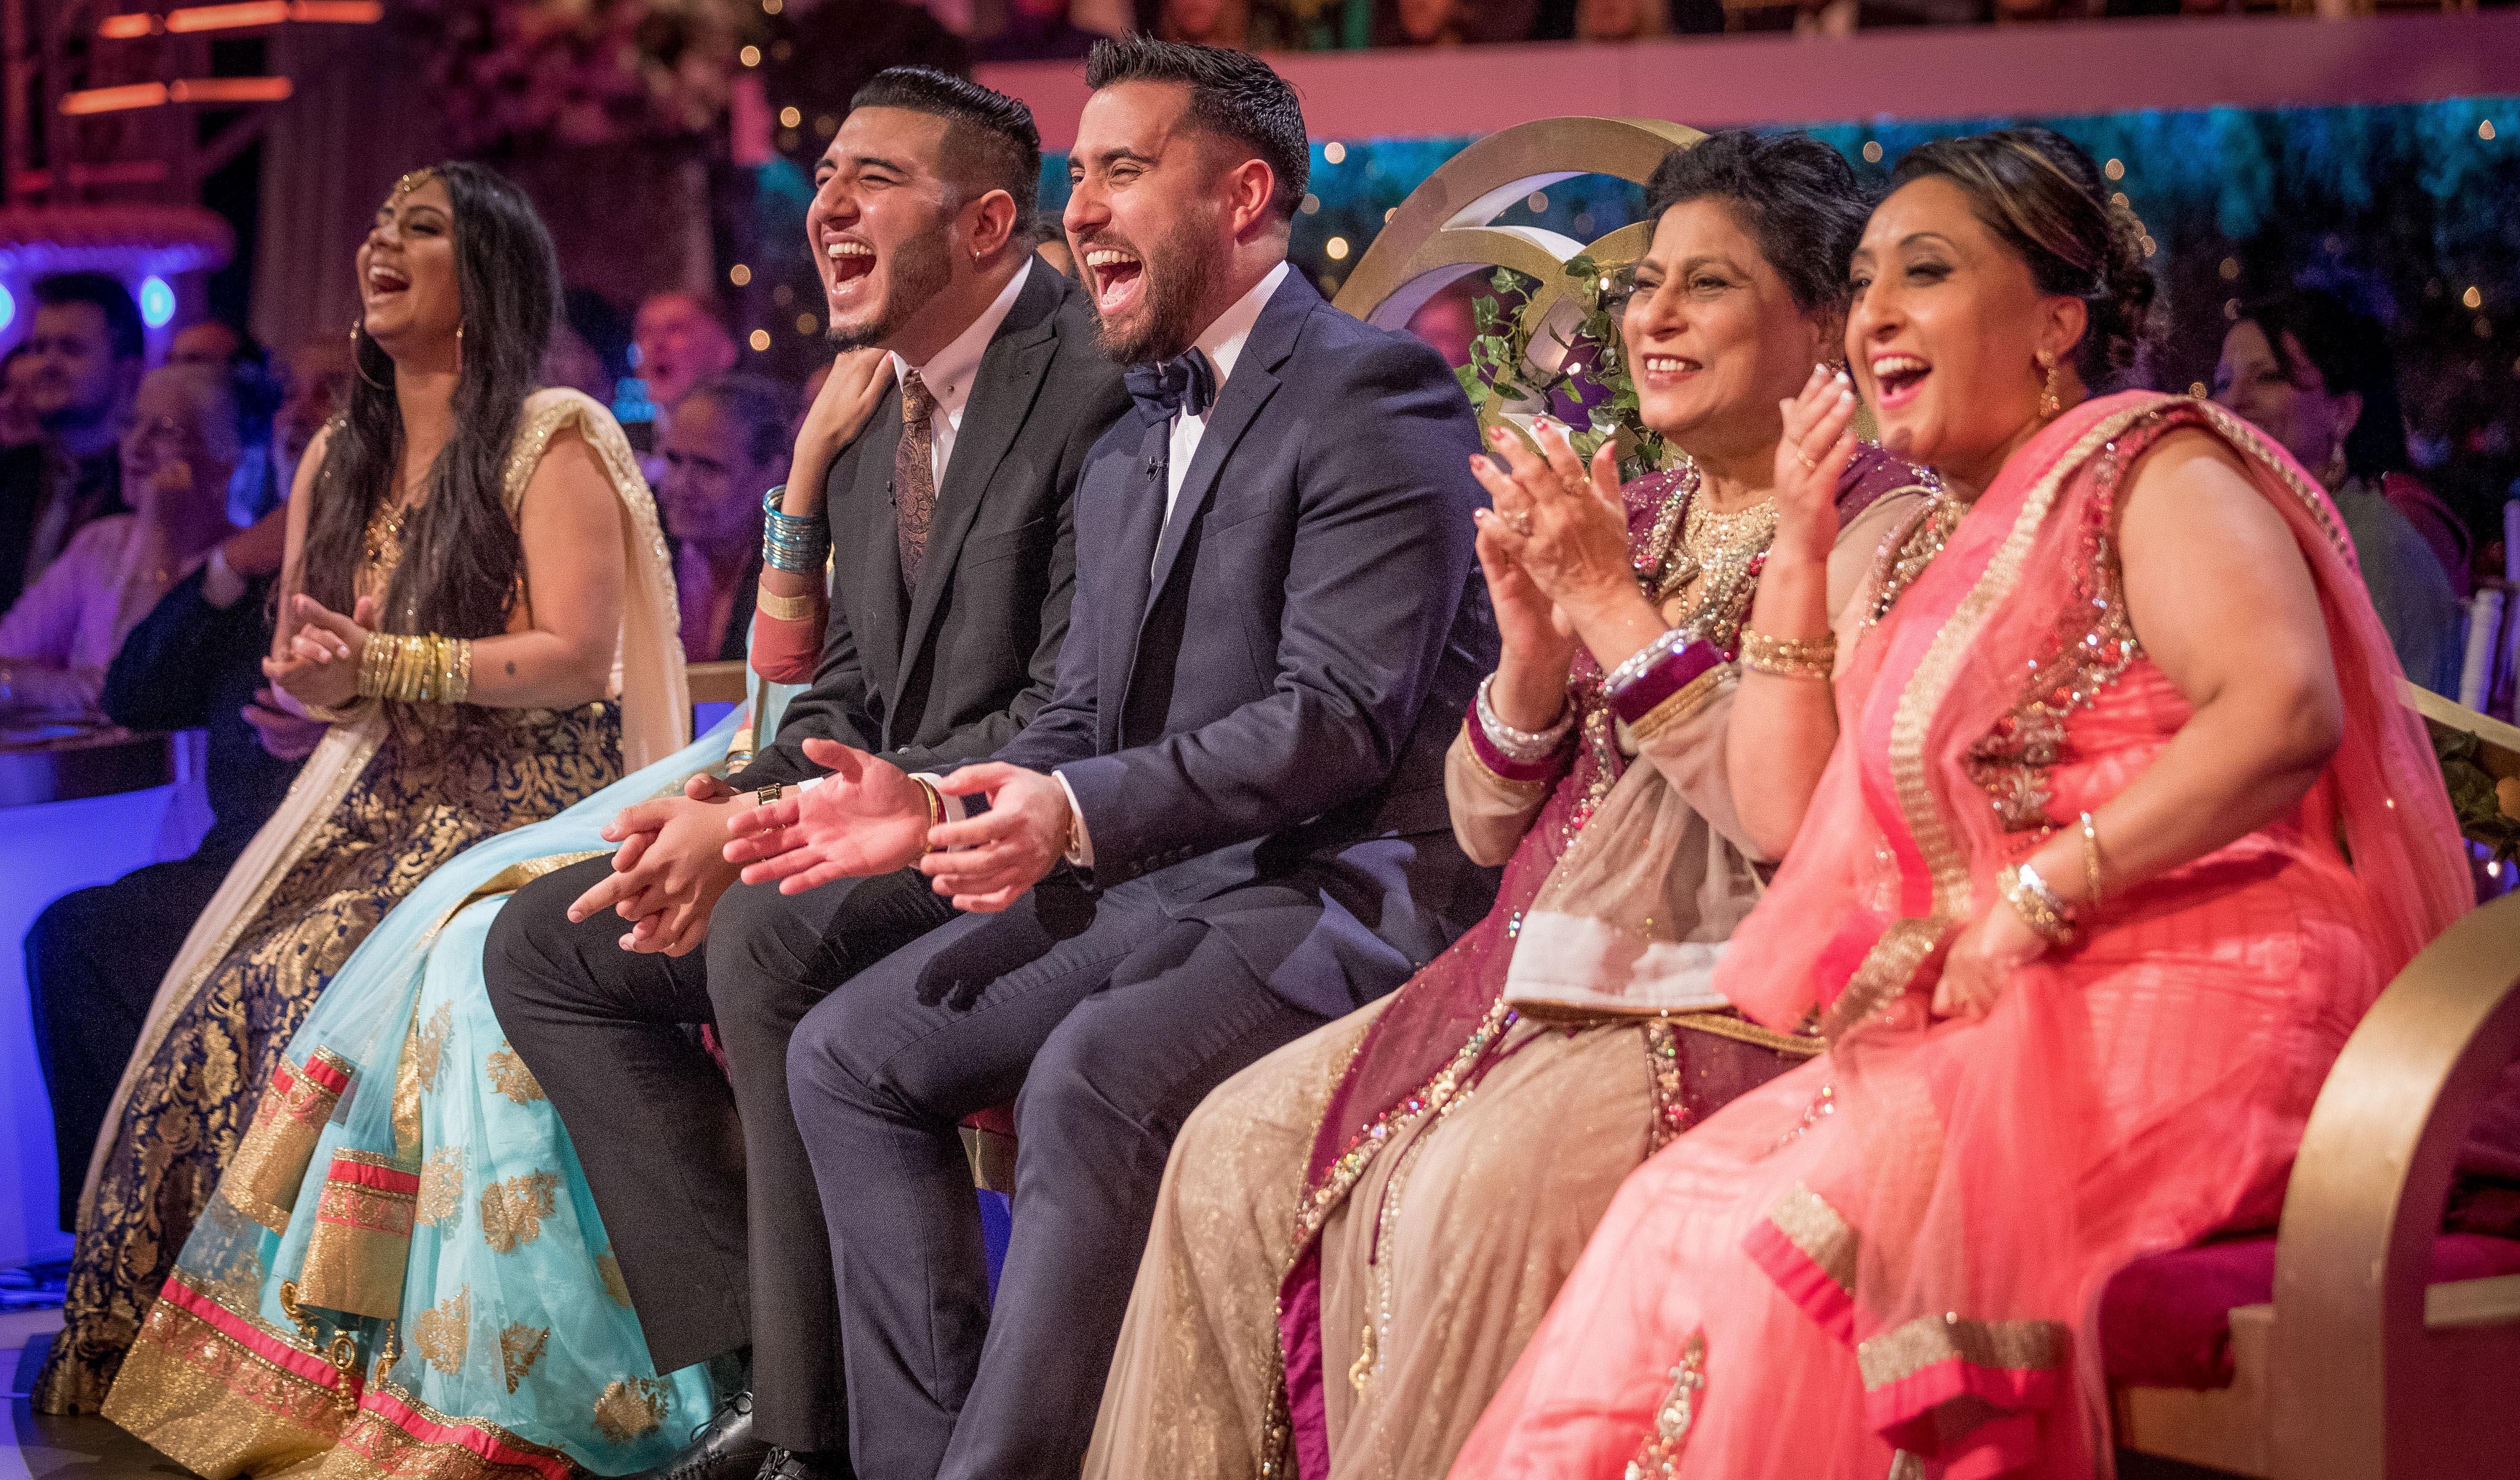 Wedding Day Winners (BBC, FT)